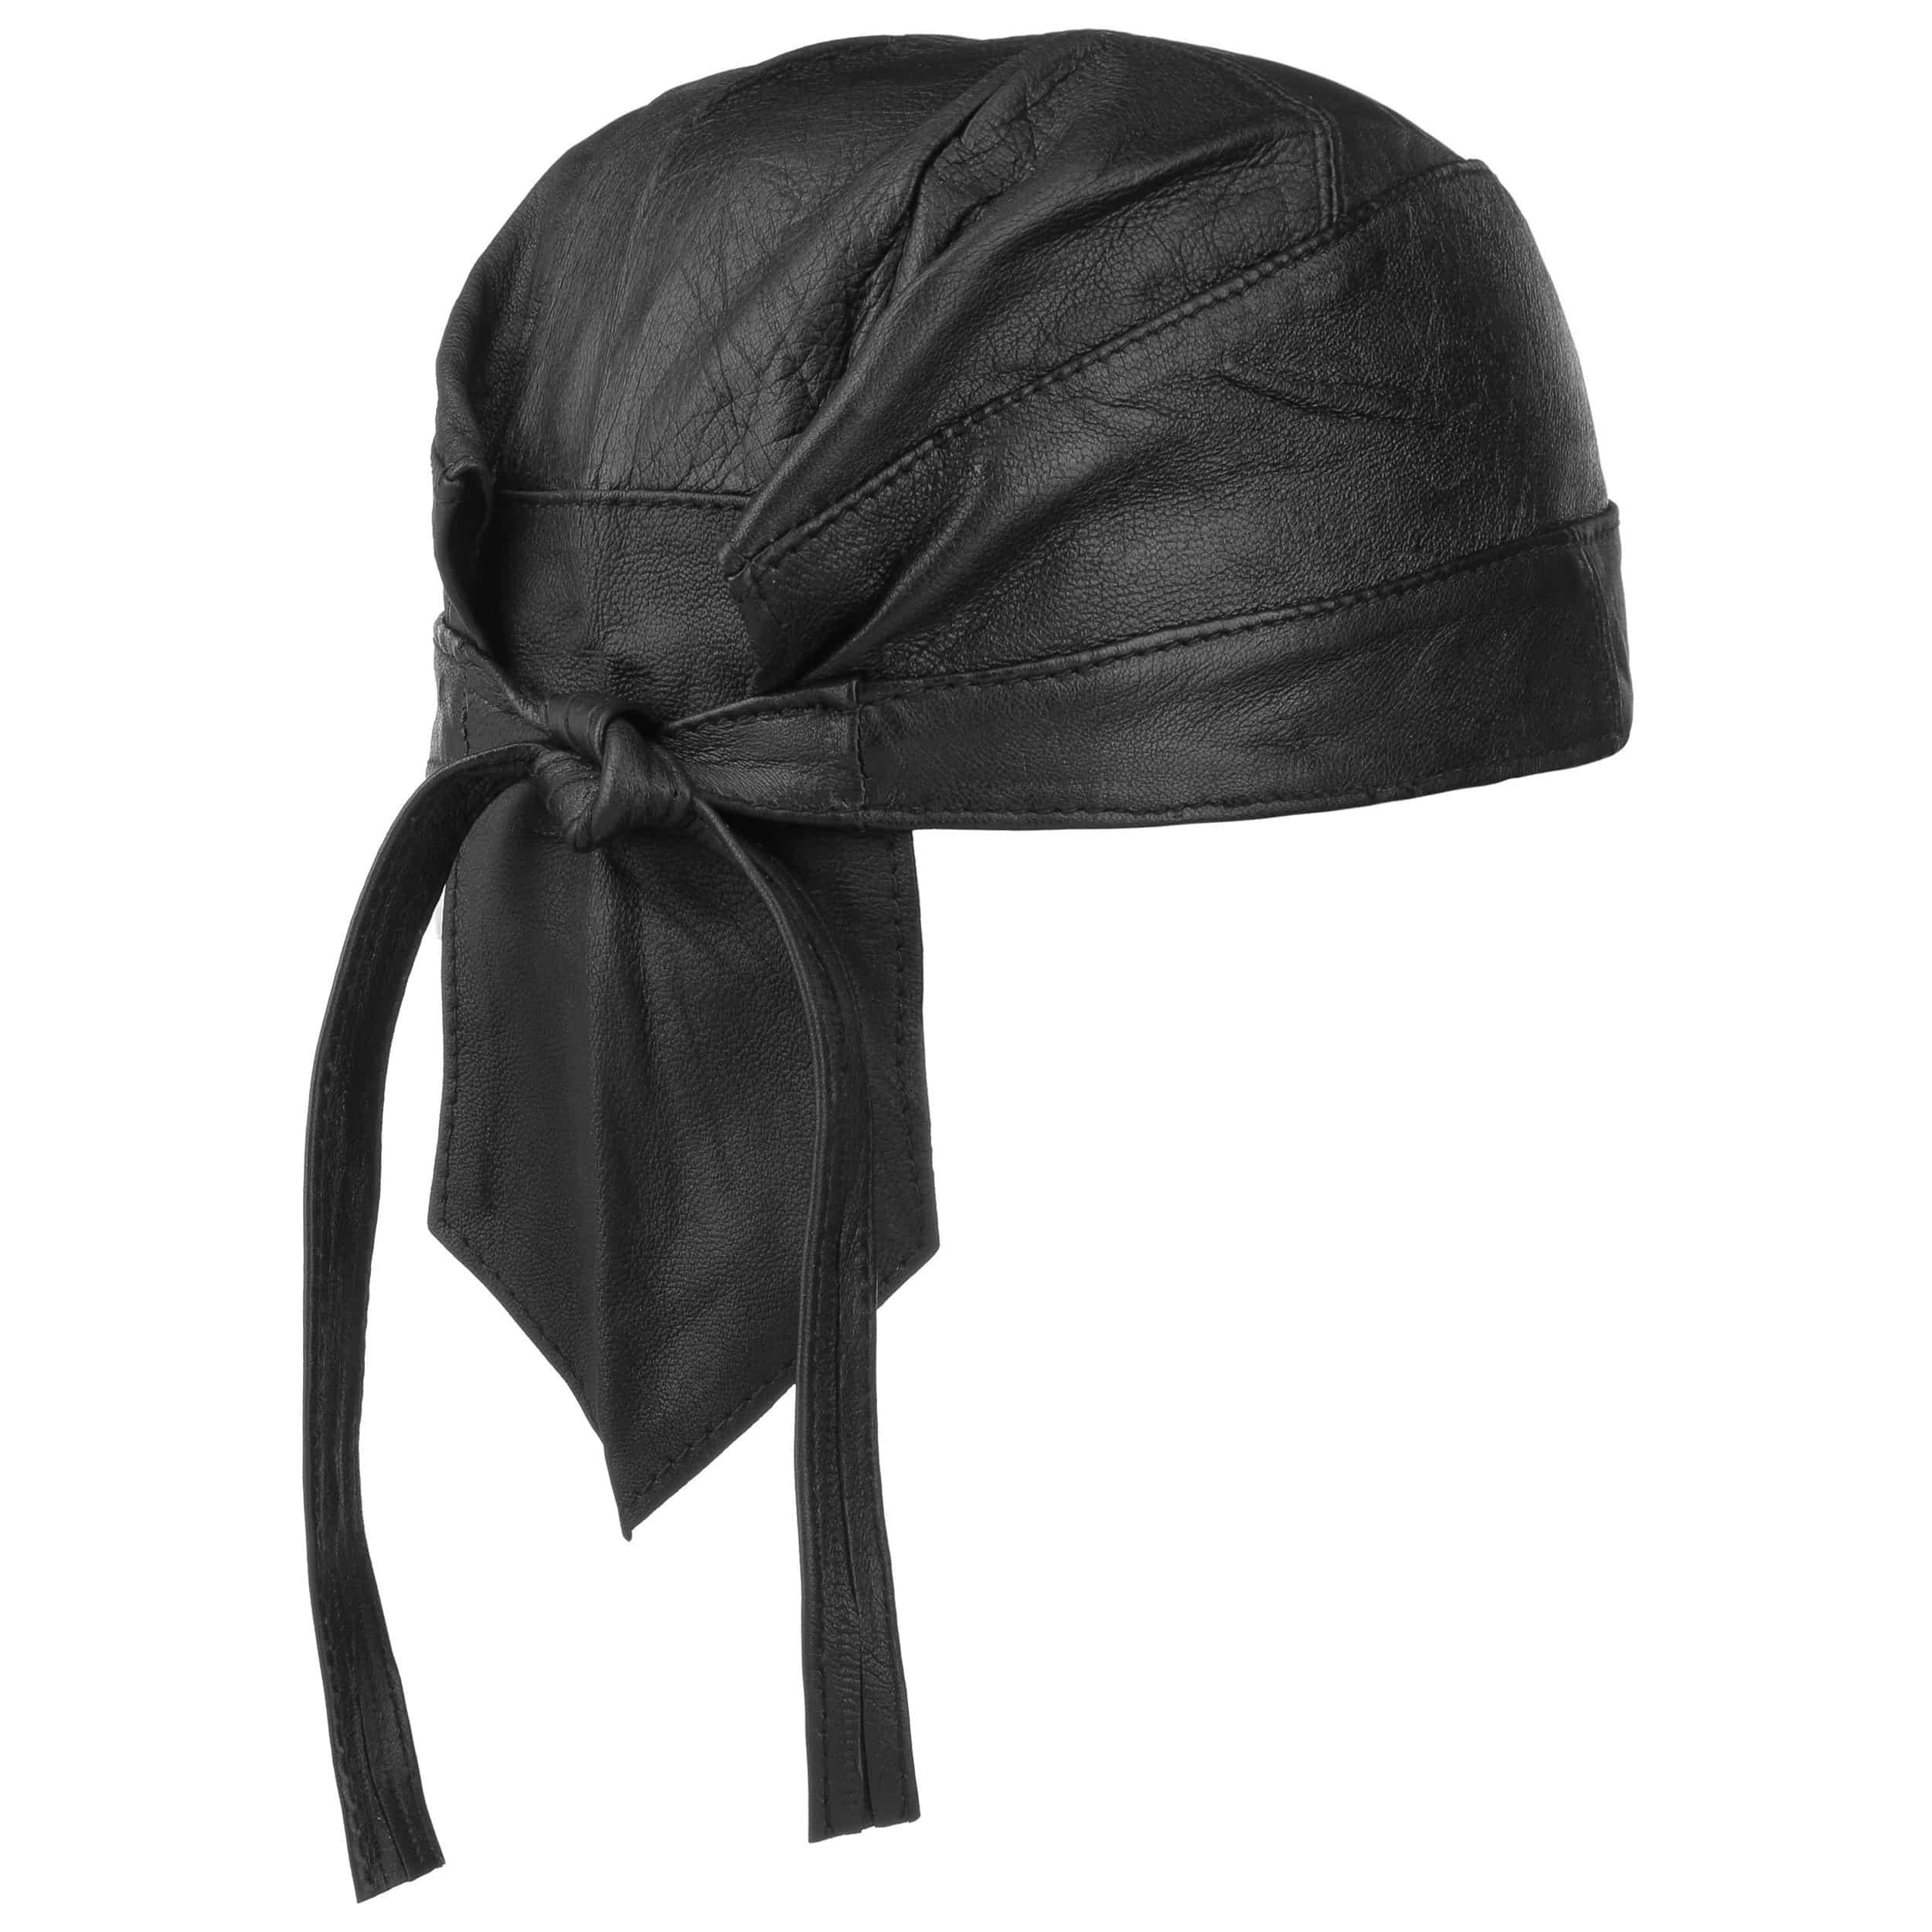 Leather Bandana By Lipodo Eur 29 95 Gt Hats Caps